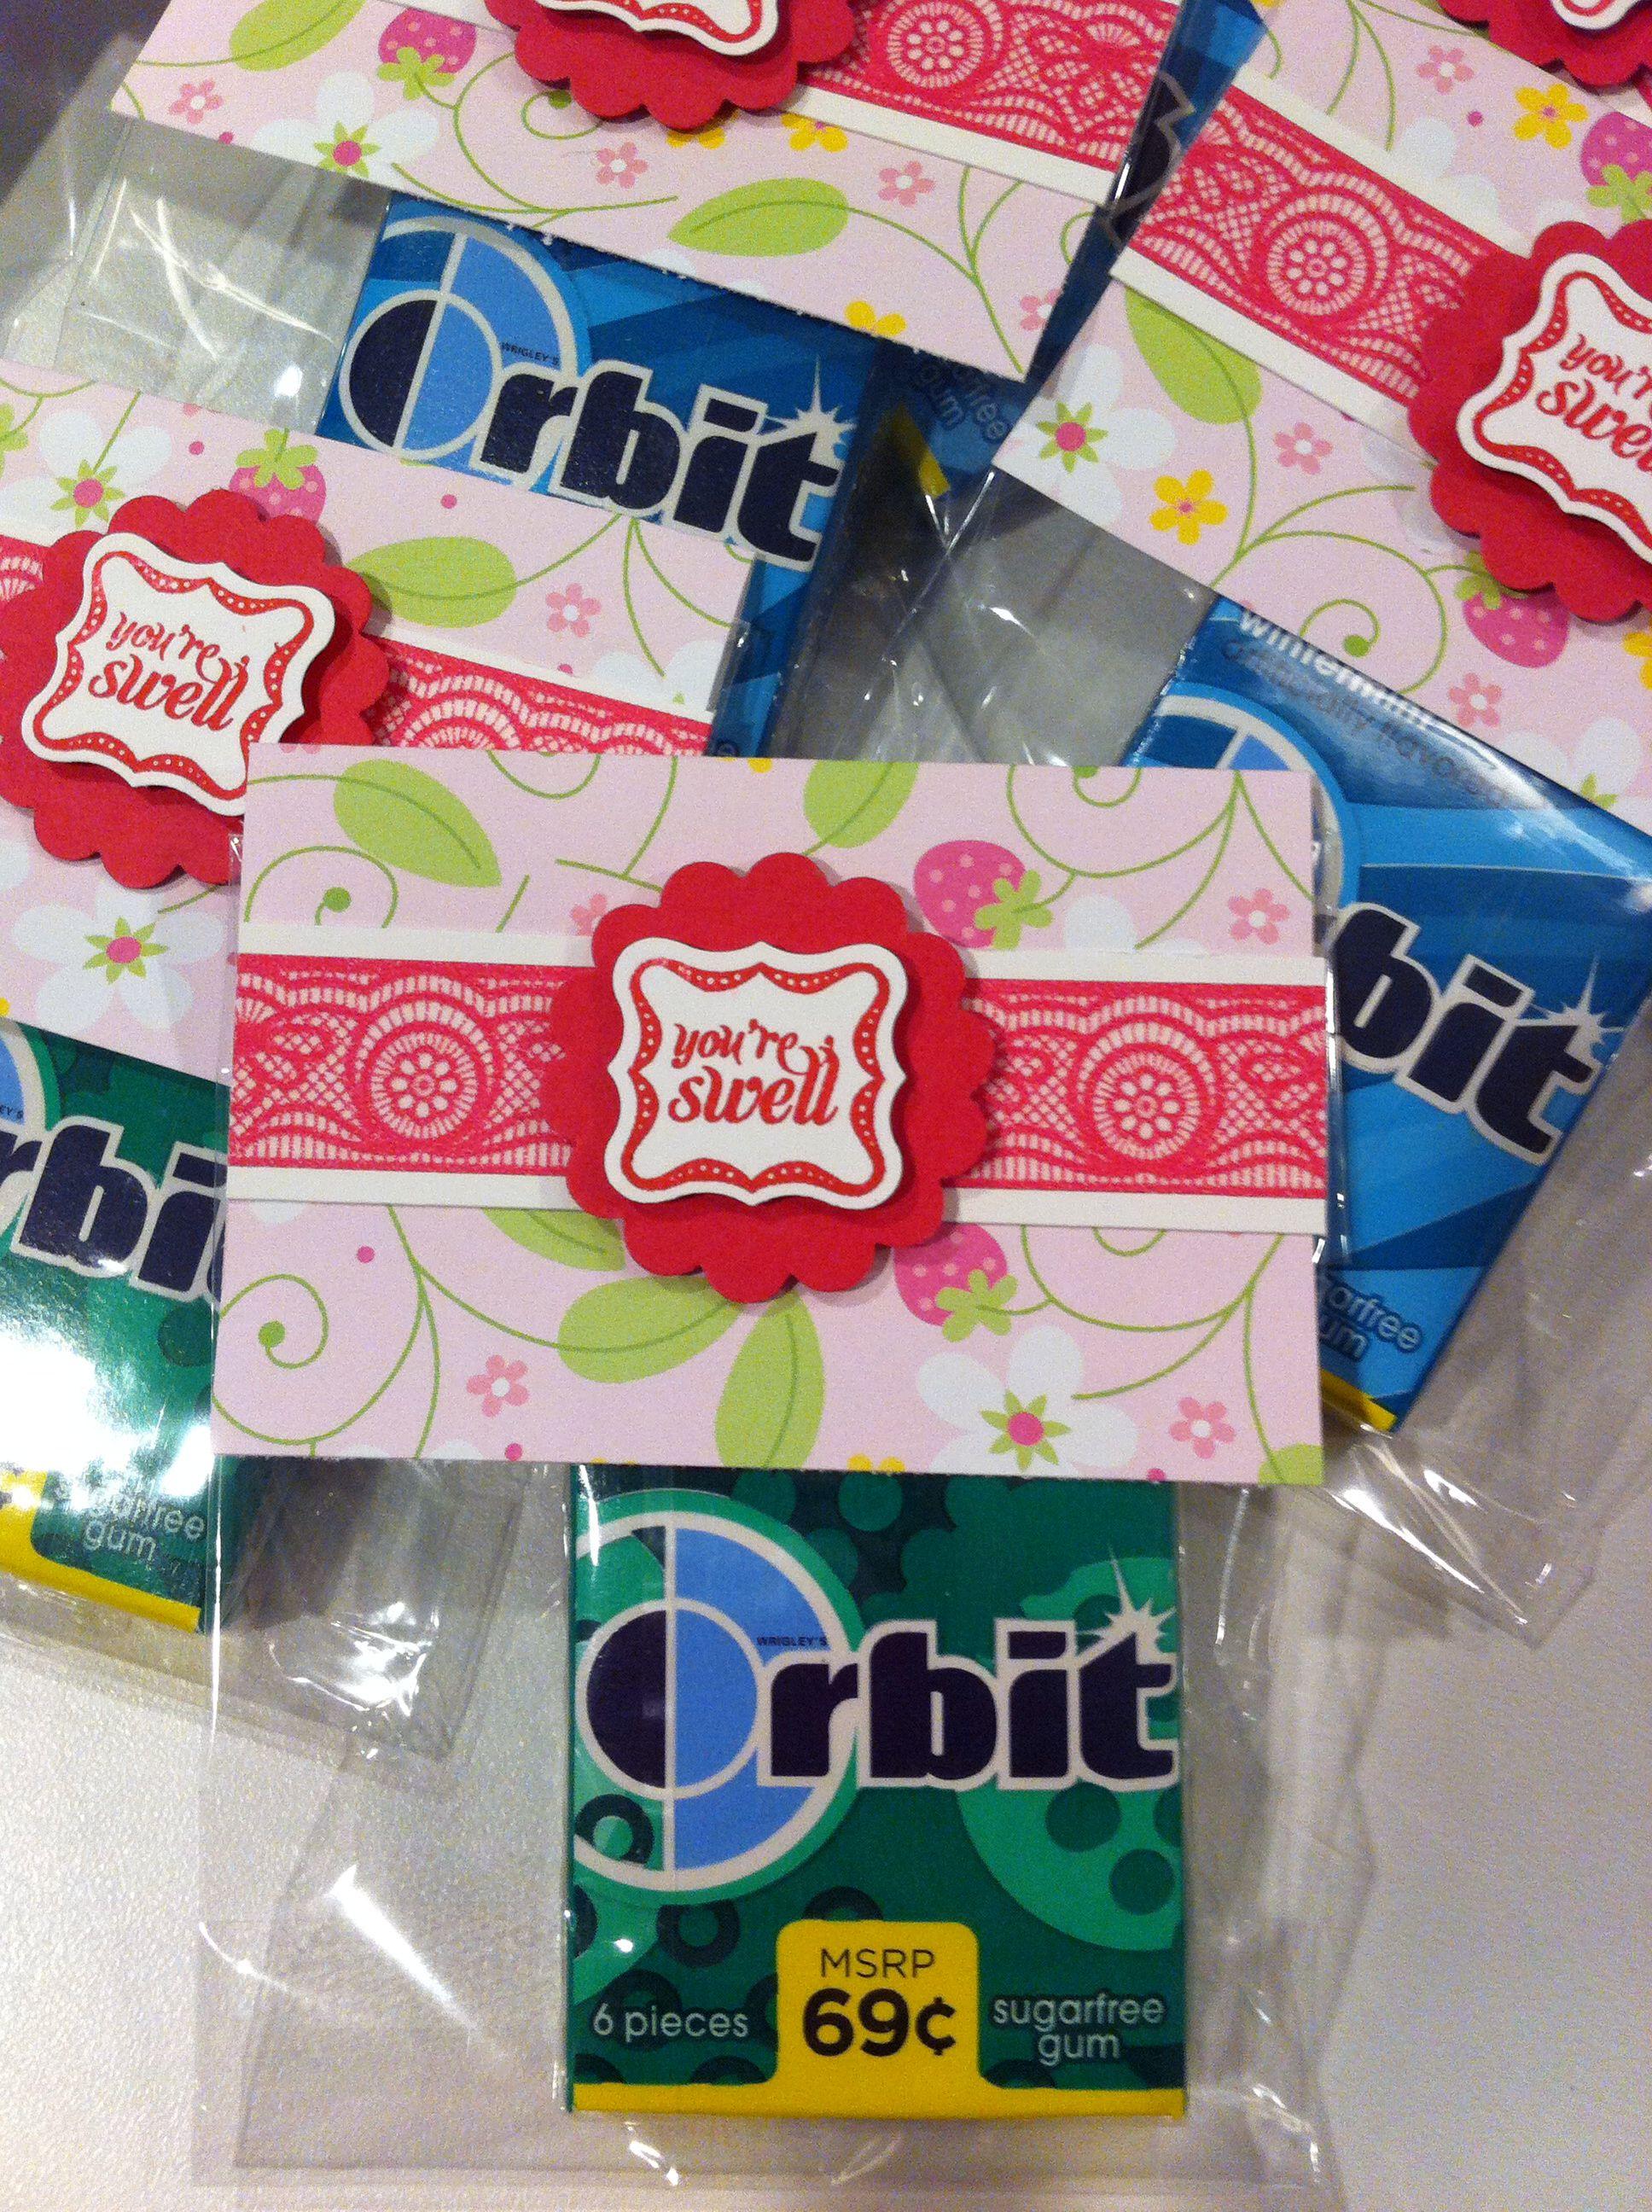 You\'re swell favors - mini gum packs | Favors & Invites | Pinterest ...